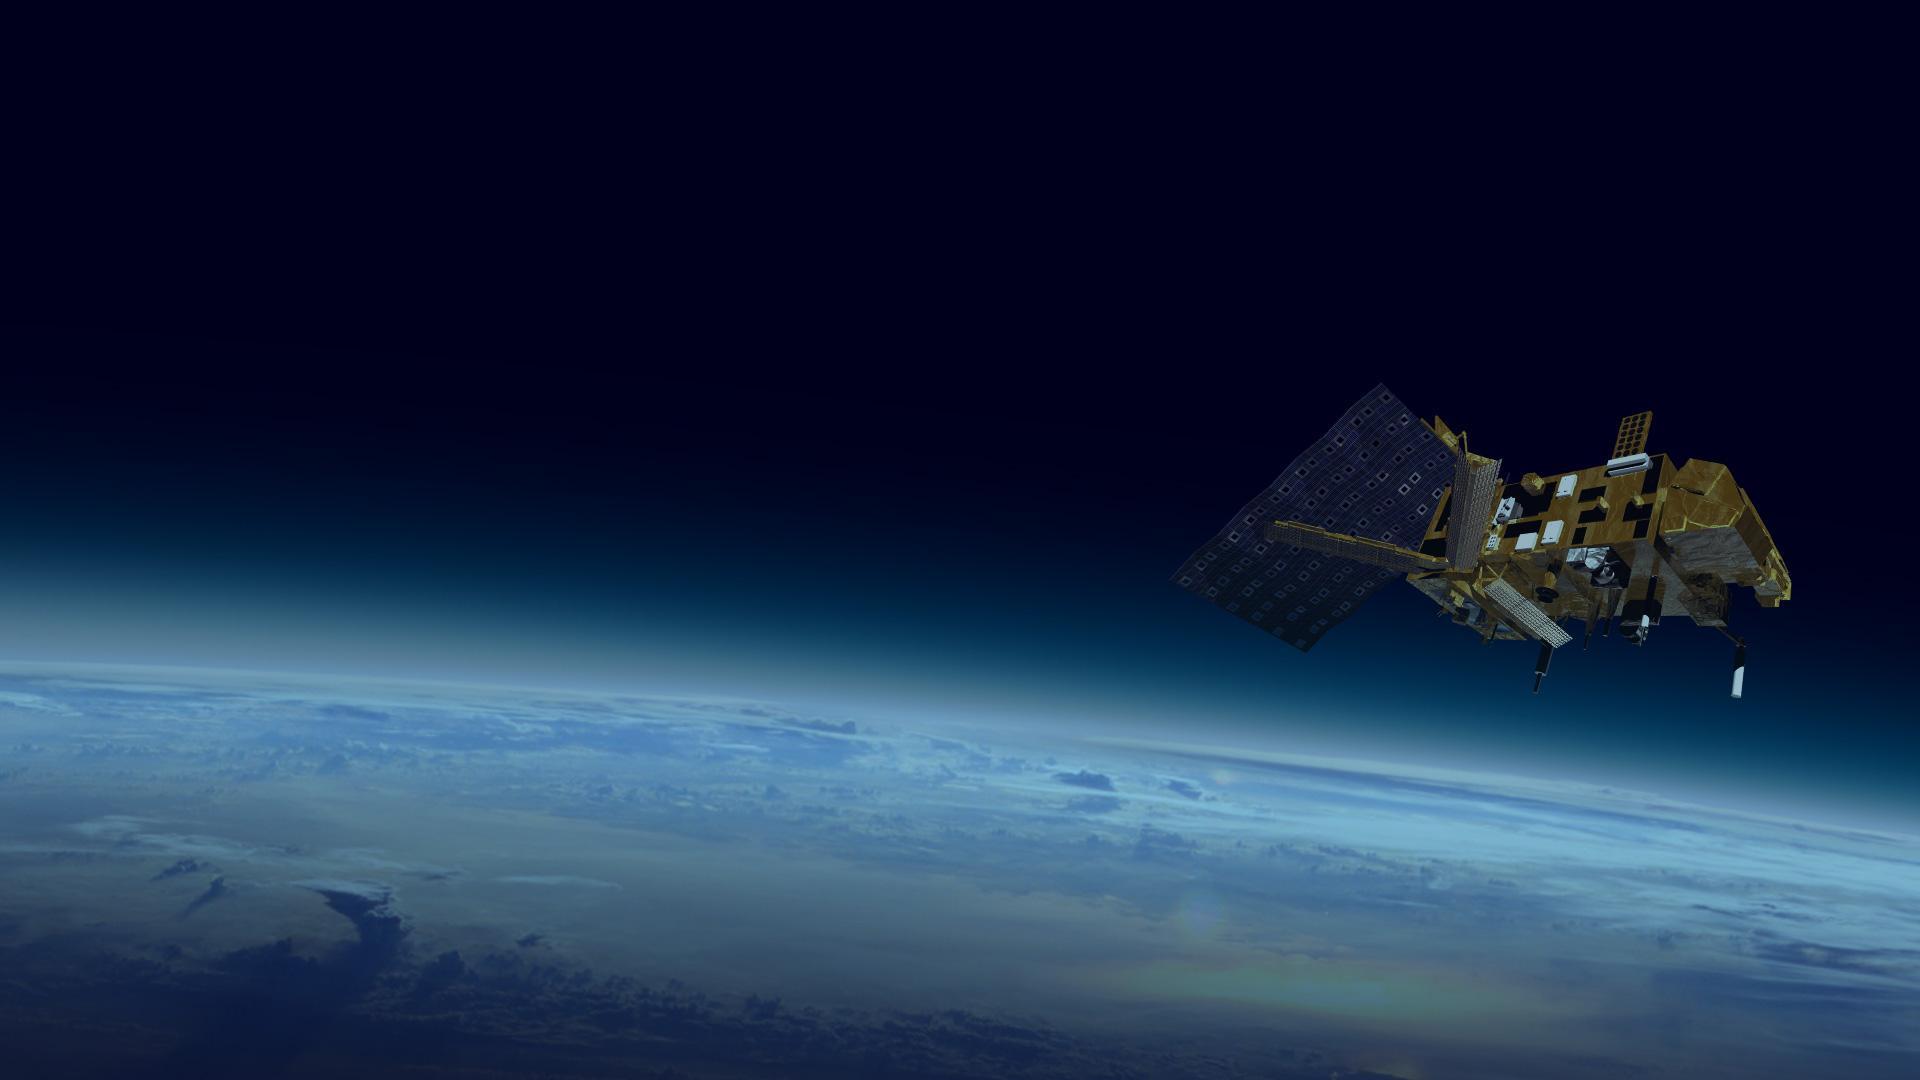 Metop satellite in orbit